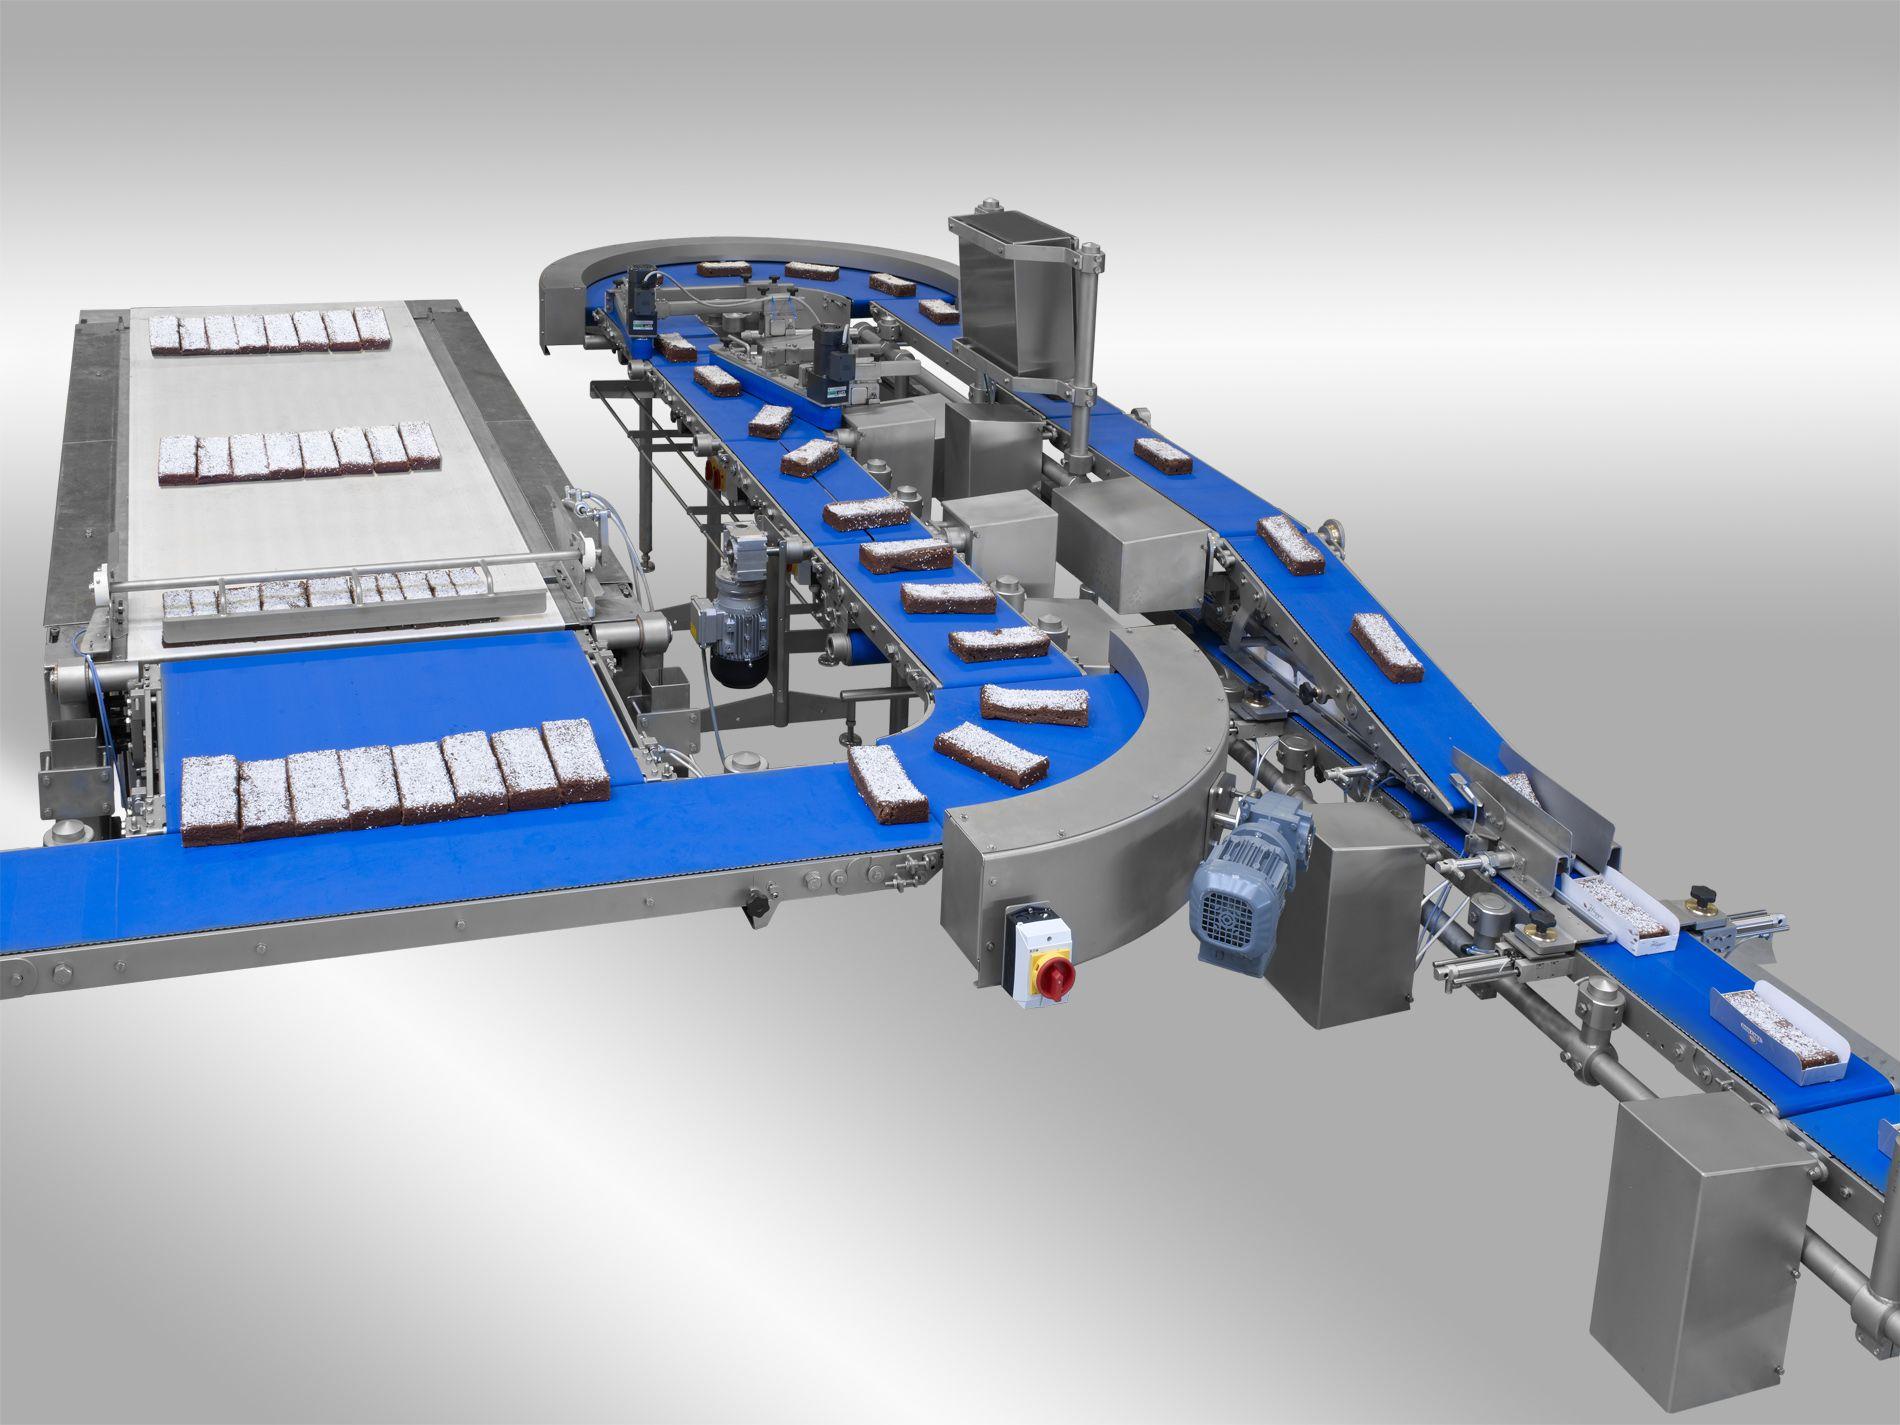 Cake conveyor system